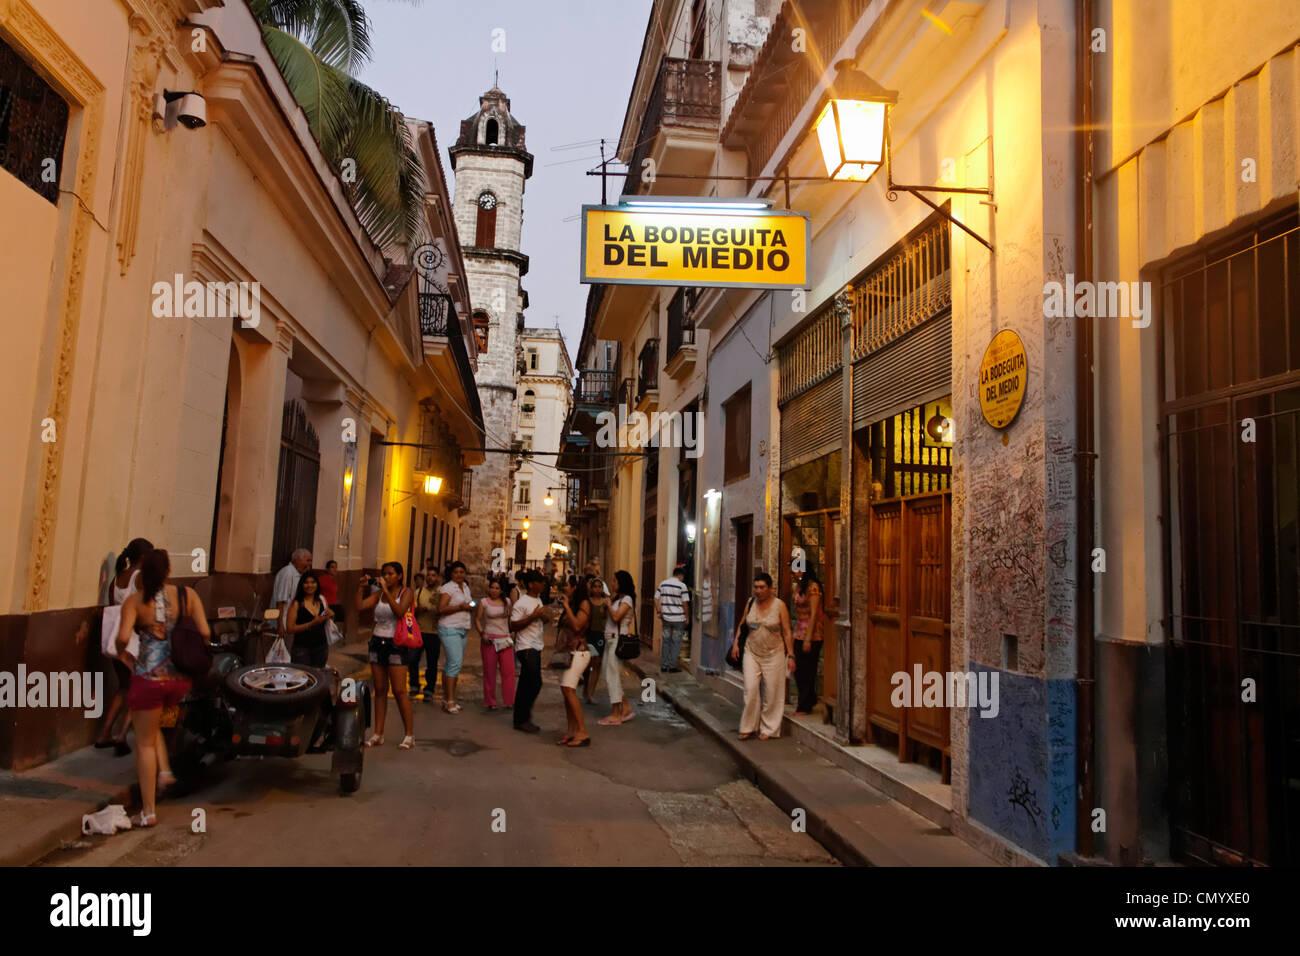 La Bodeguita del Medio, Havanna Viejo, Hemingways Bar in Havanna, Kuba, große Antillen, Antillen, Karibik, Stockbild